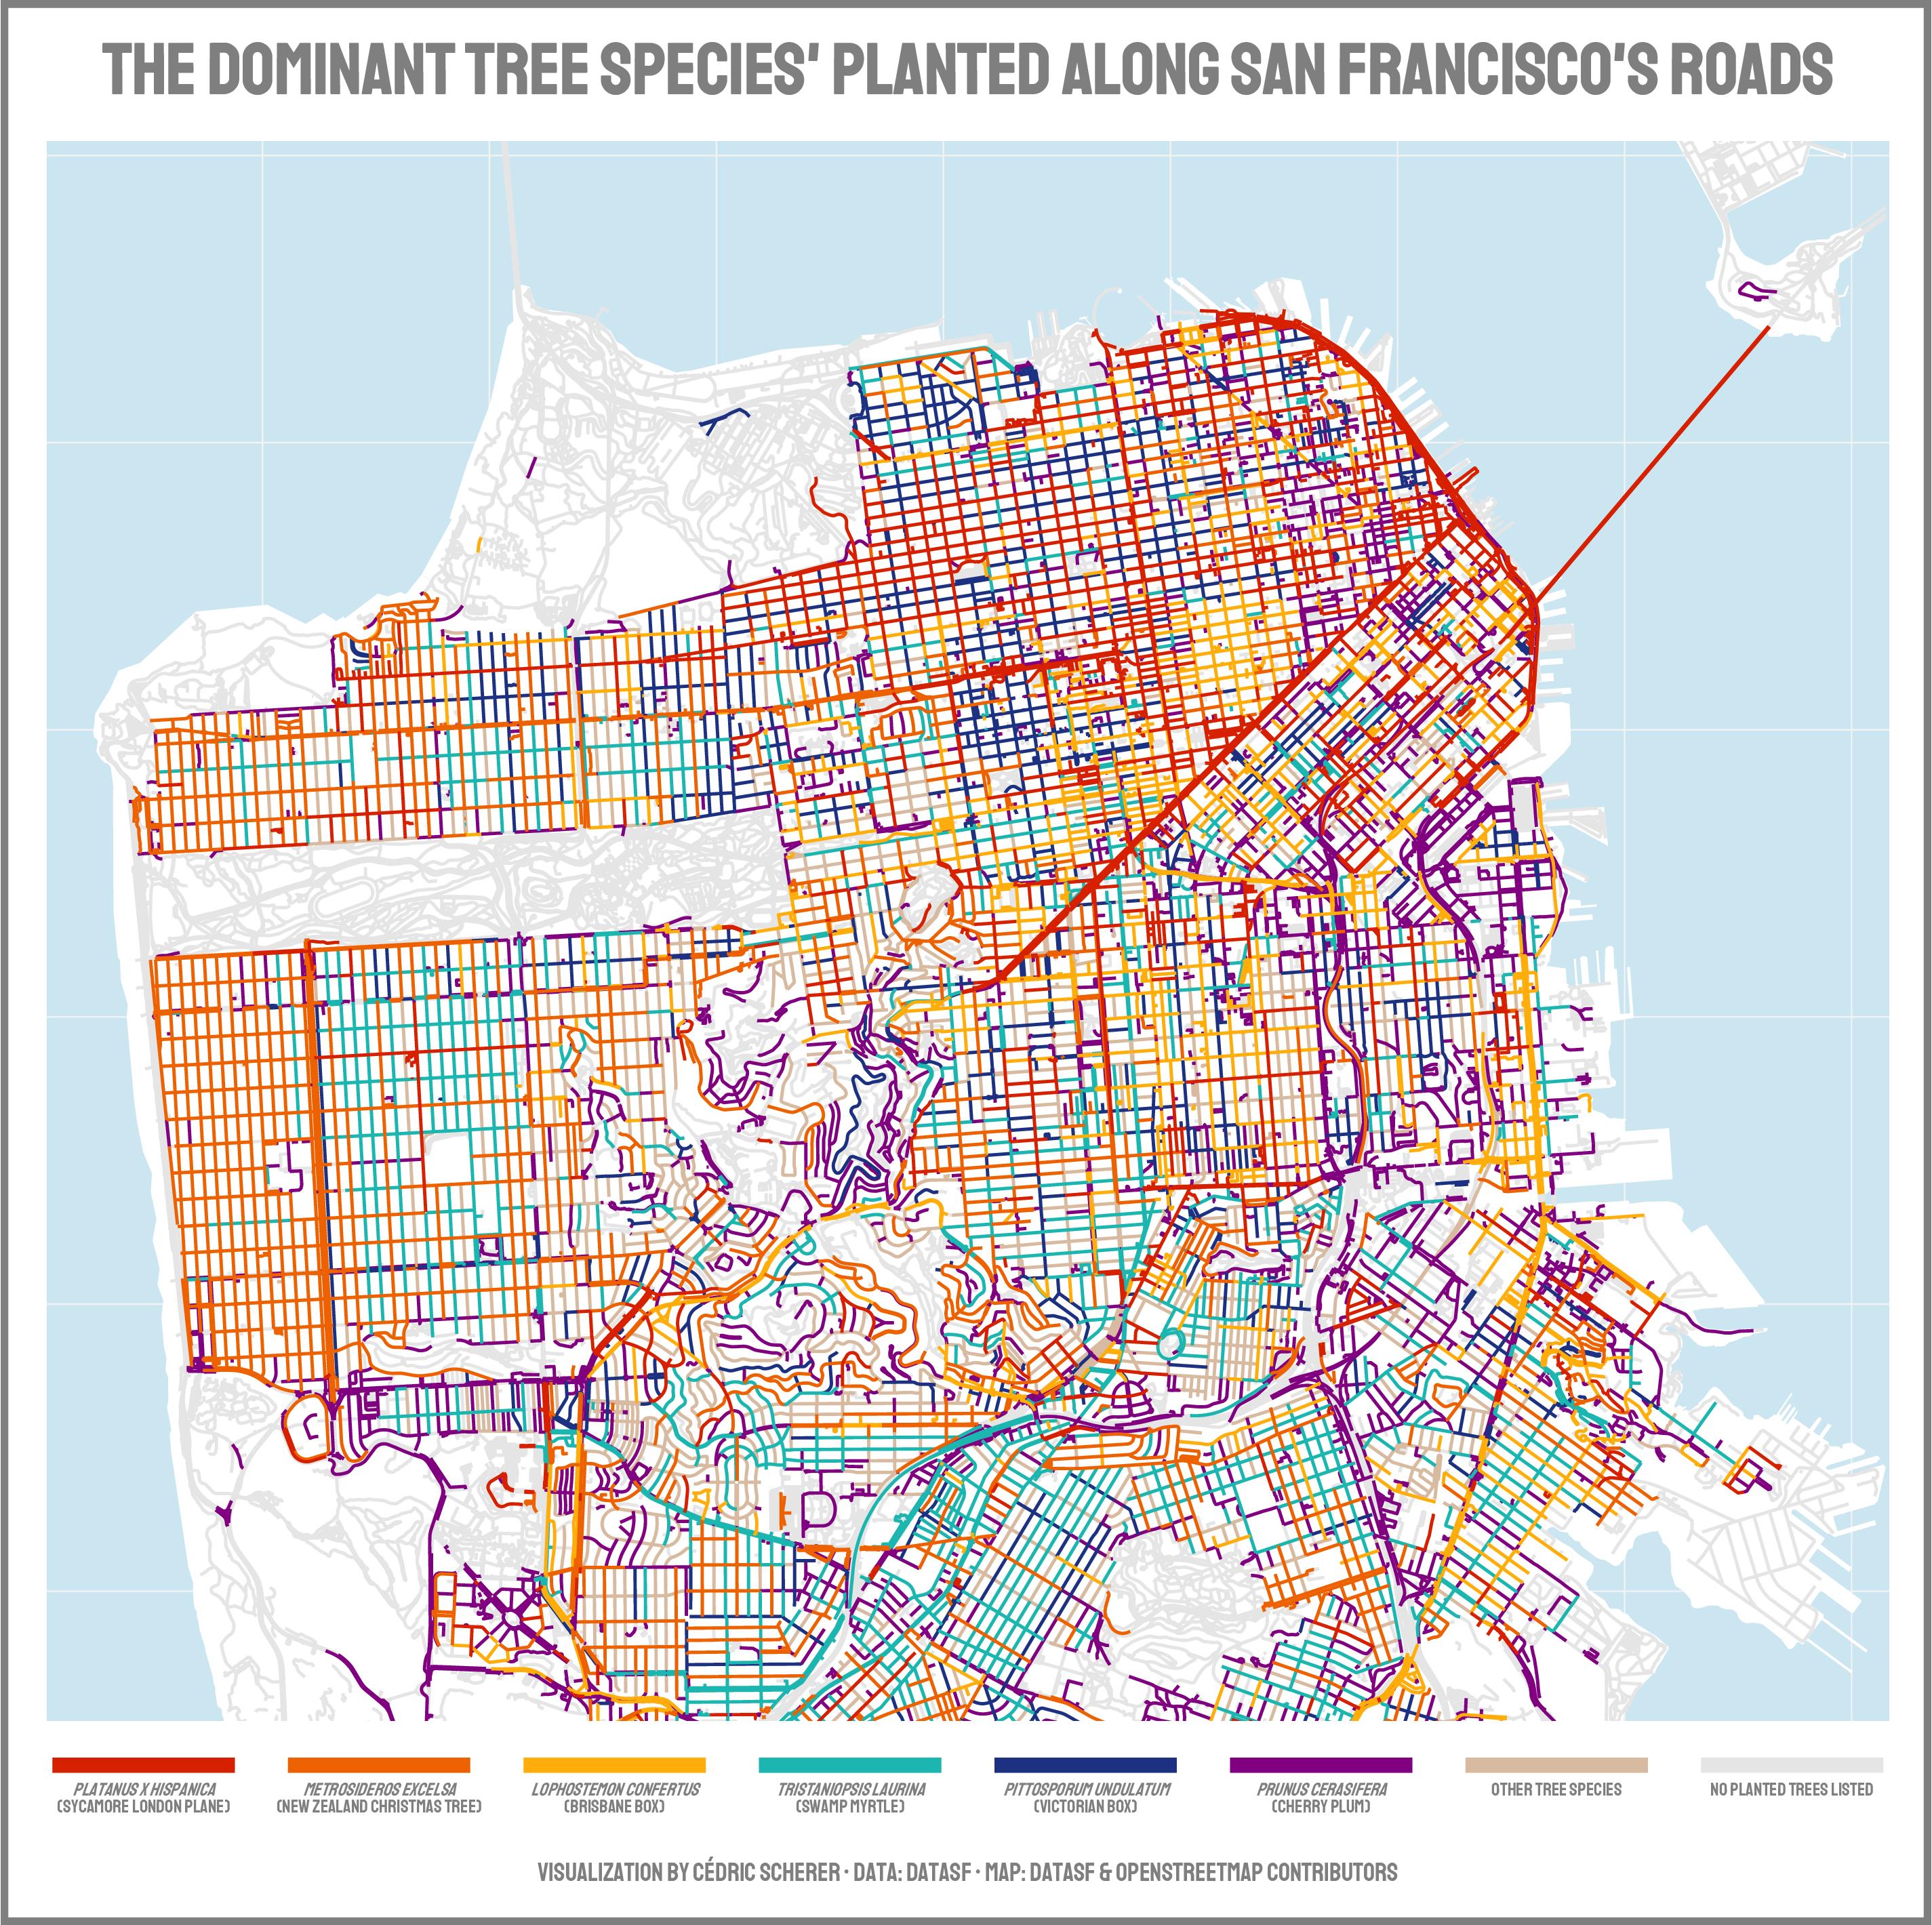 ./plots/2020_05/2020_05_TreesSF.png